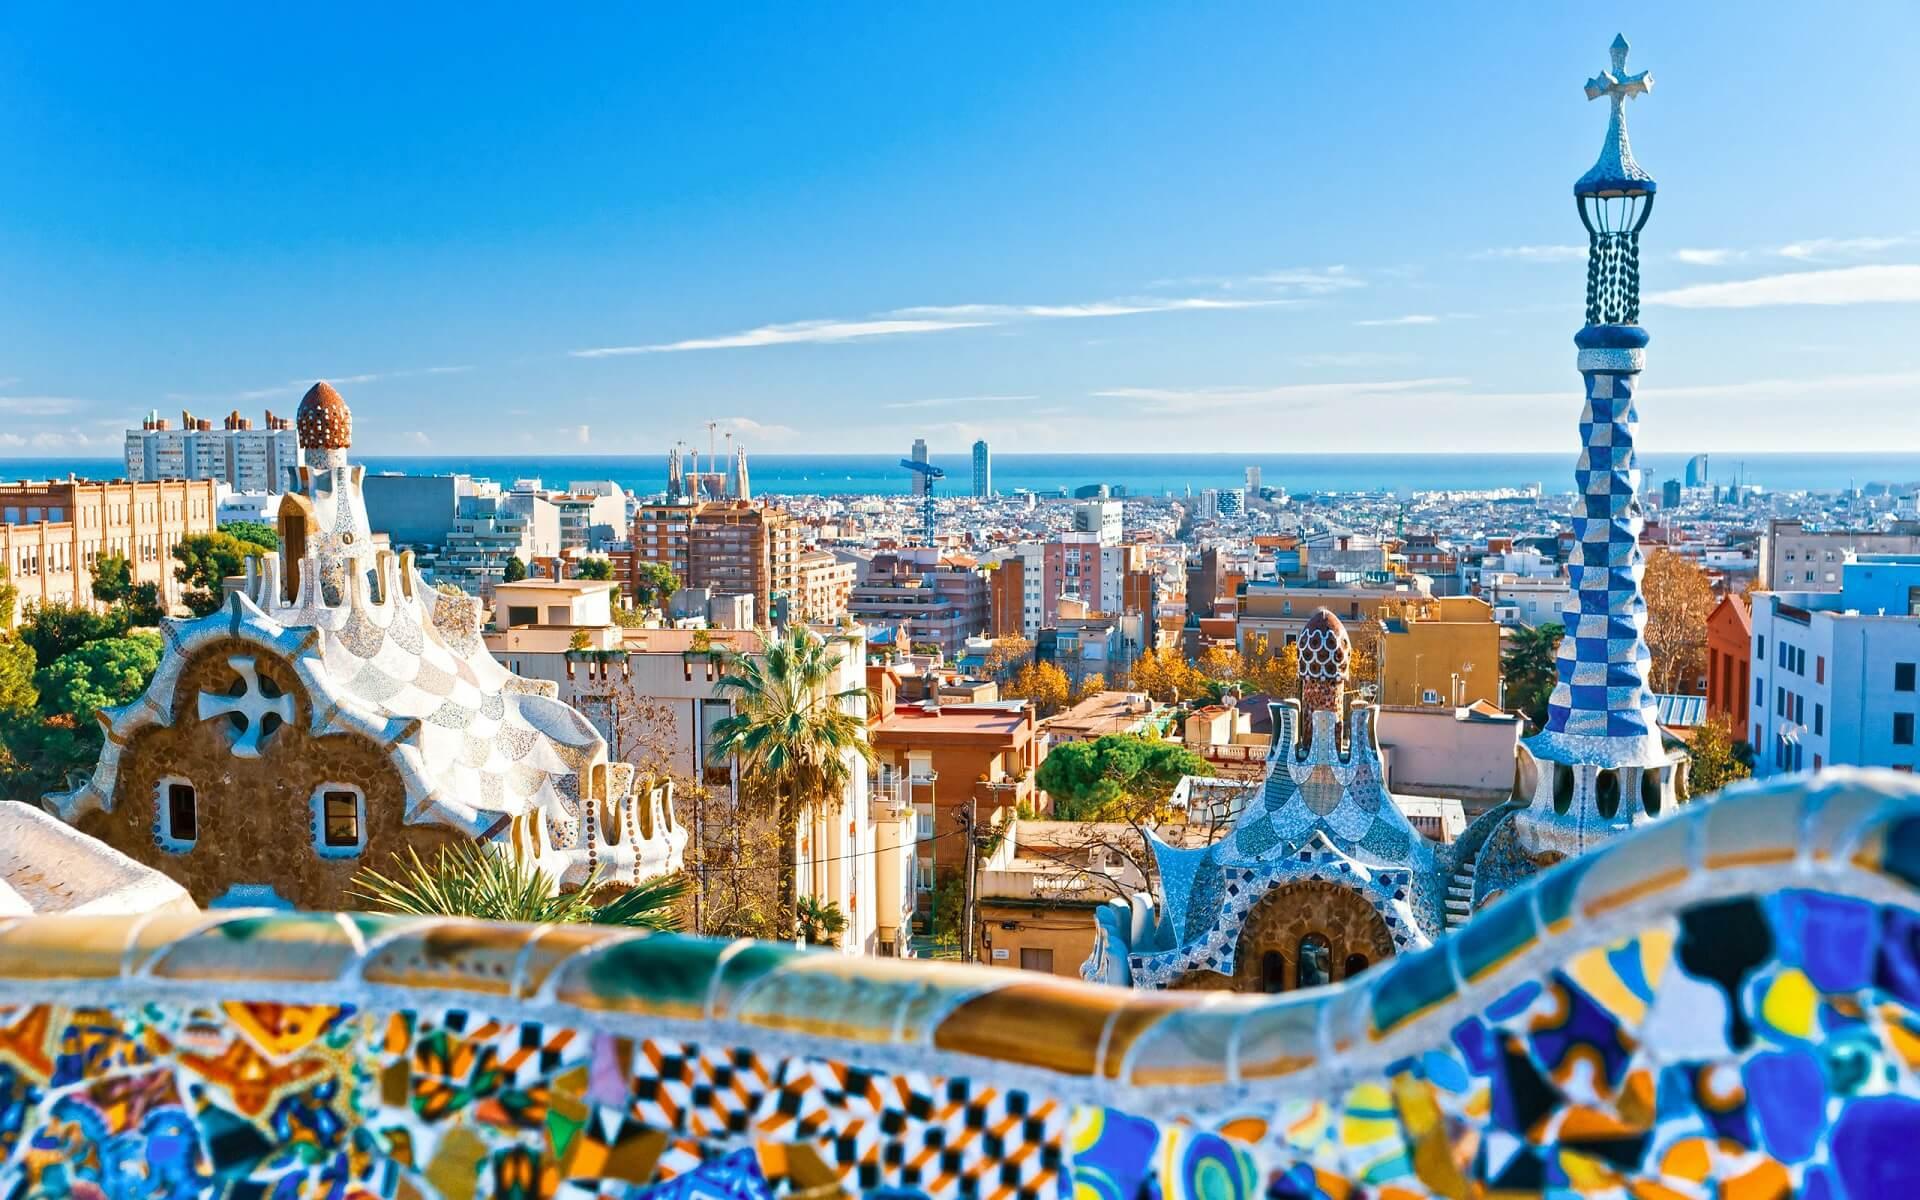 Barcelona - Cities Where Art Lives